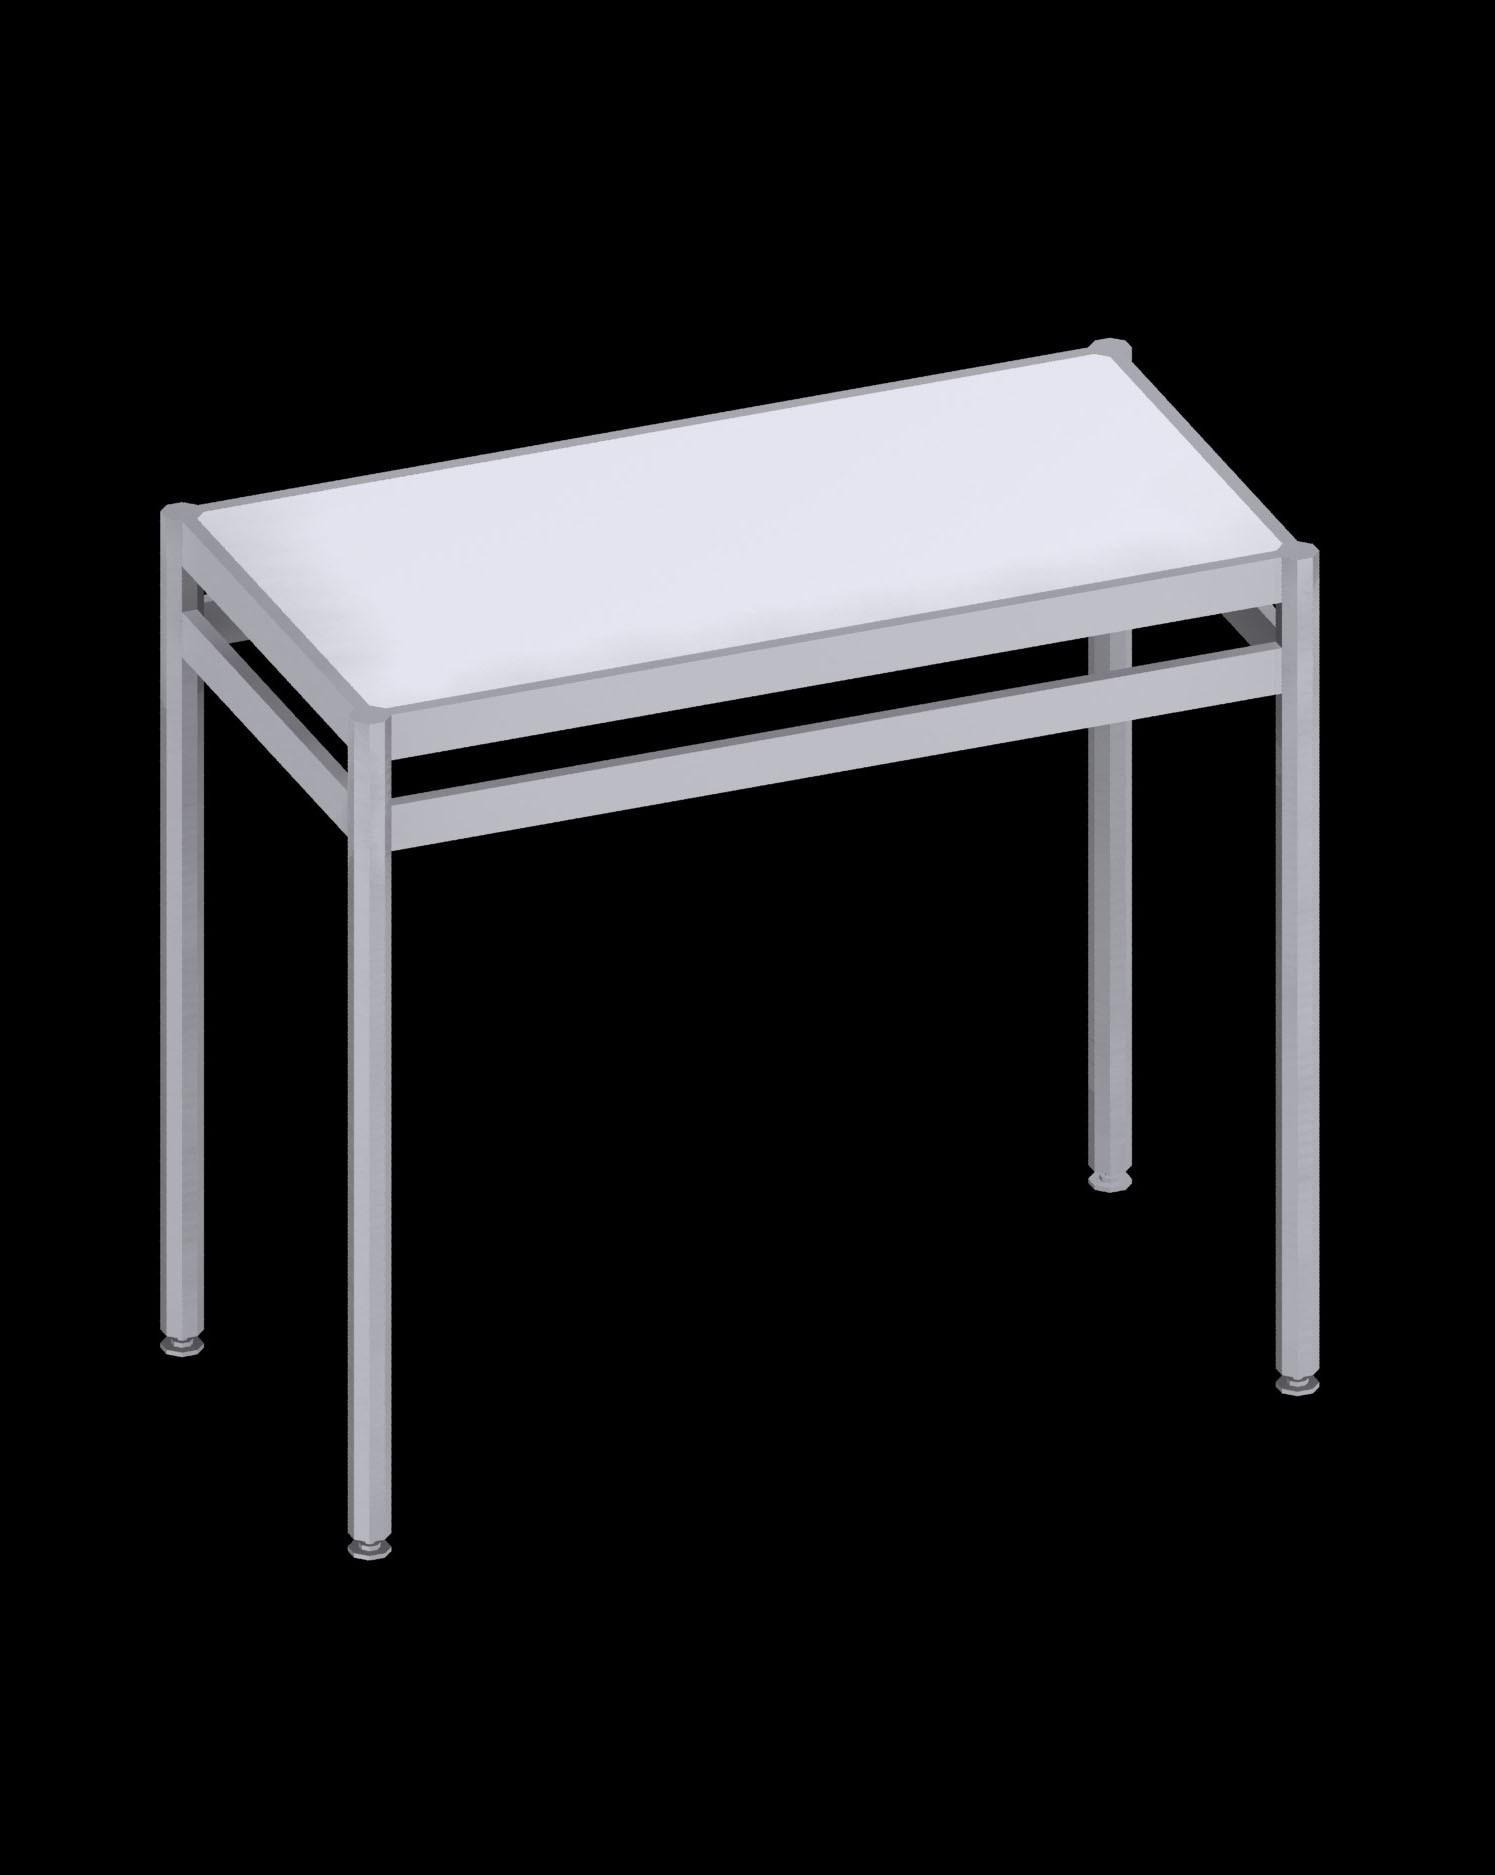 Octanorm short counter - White